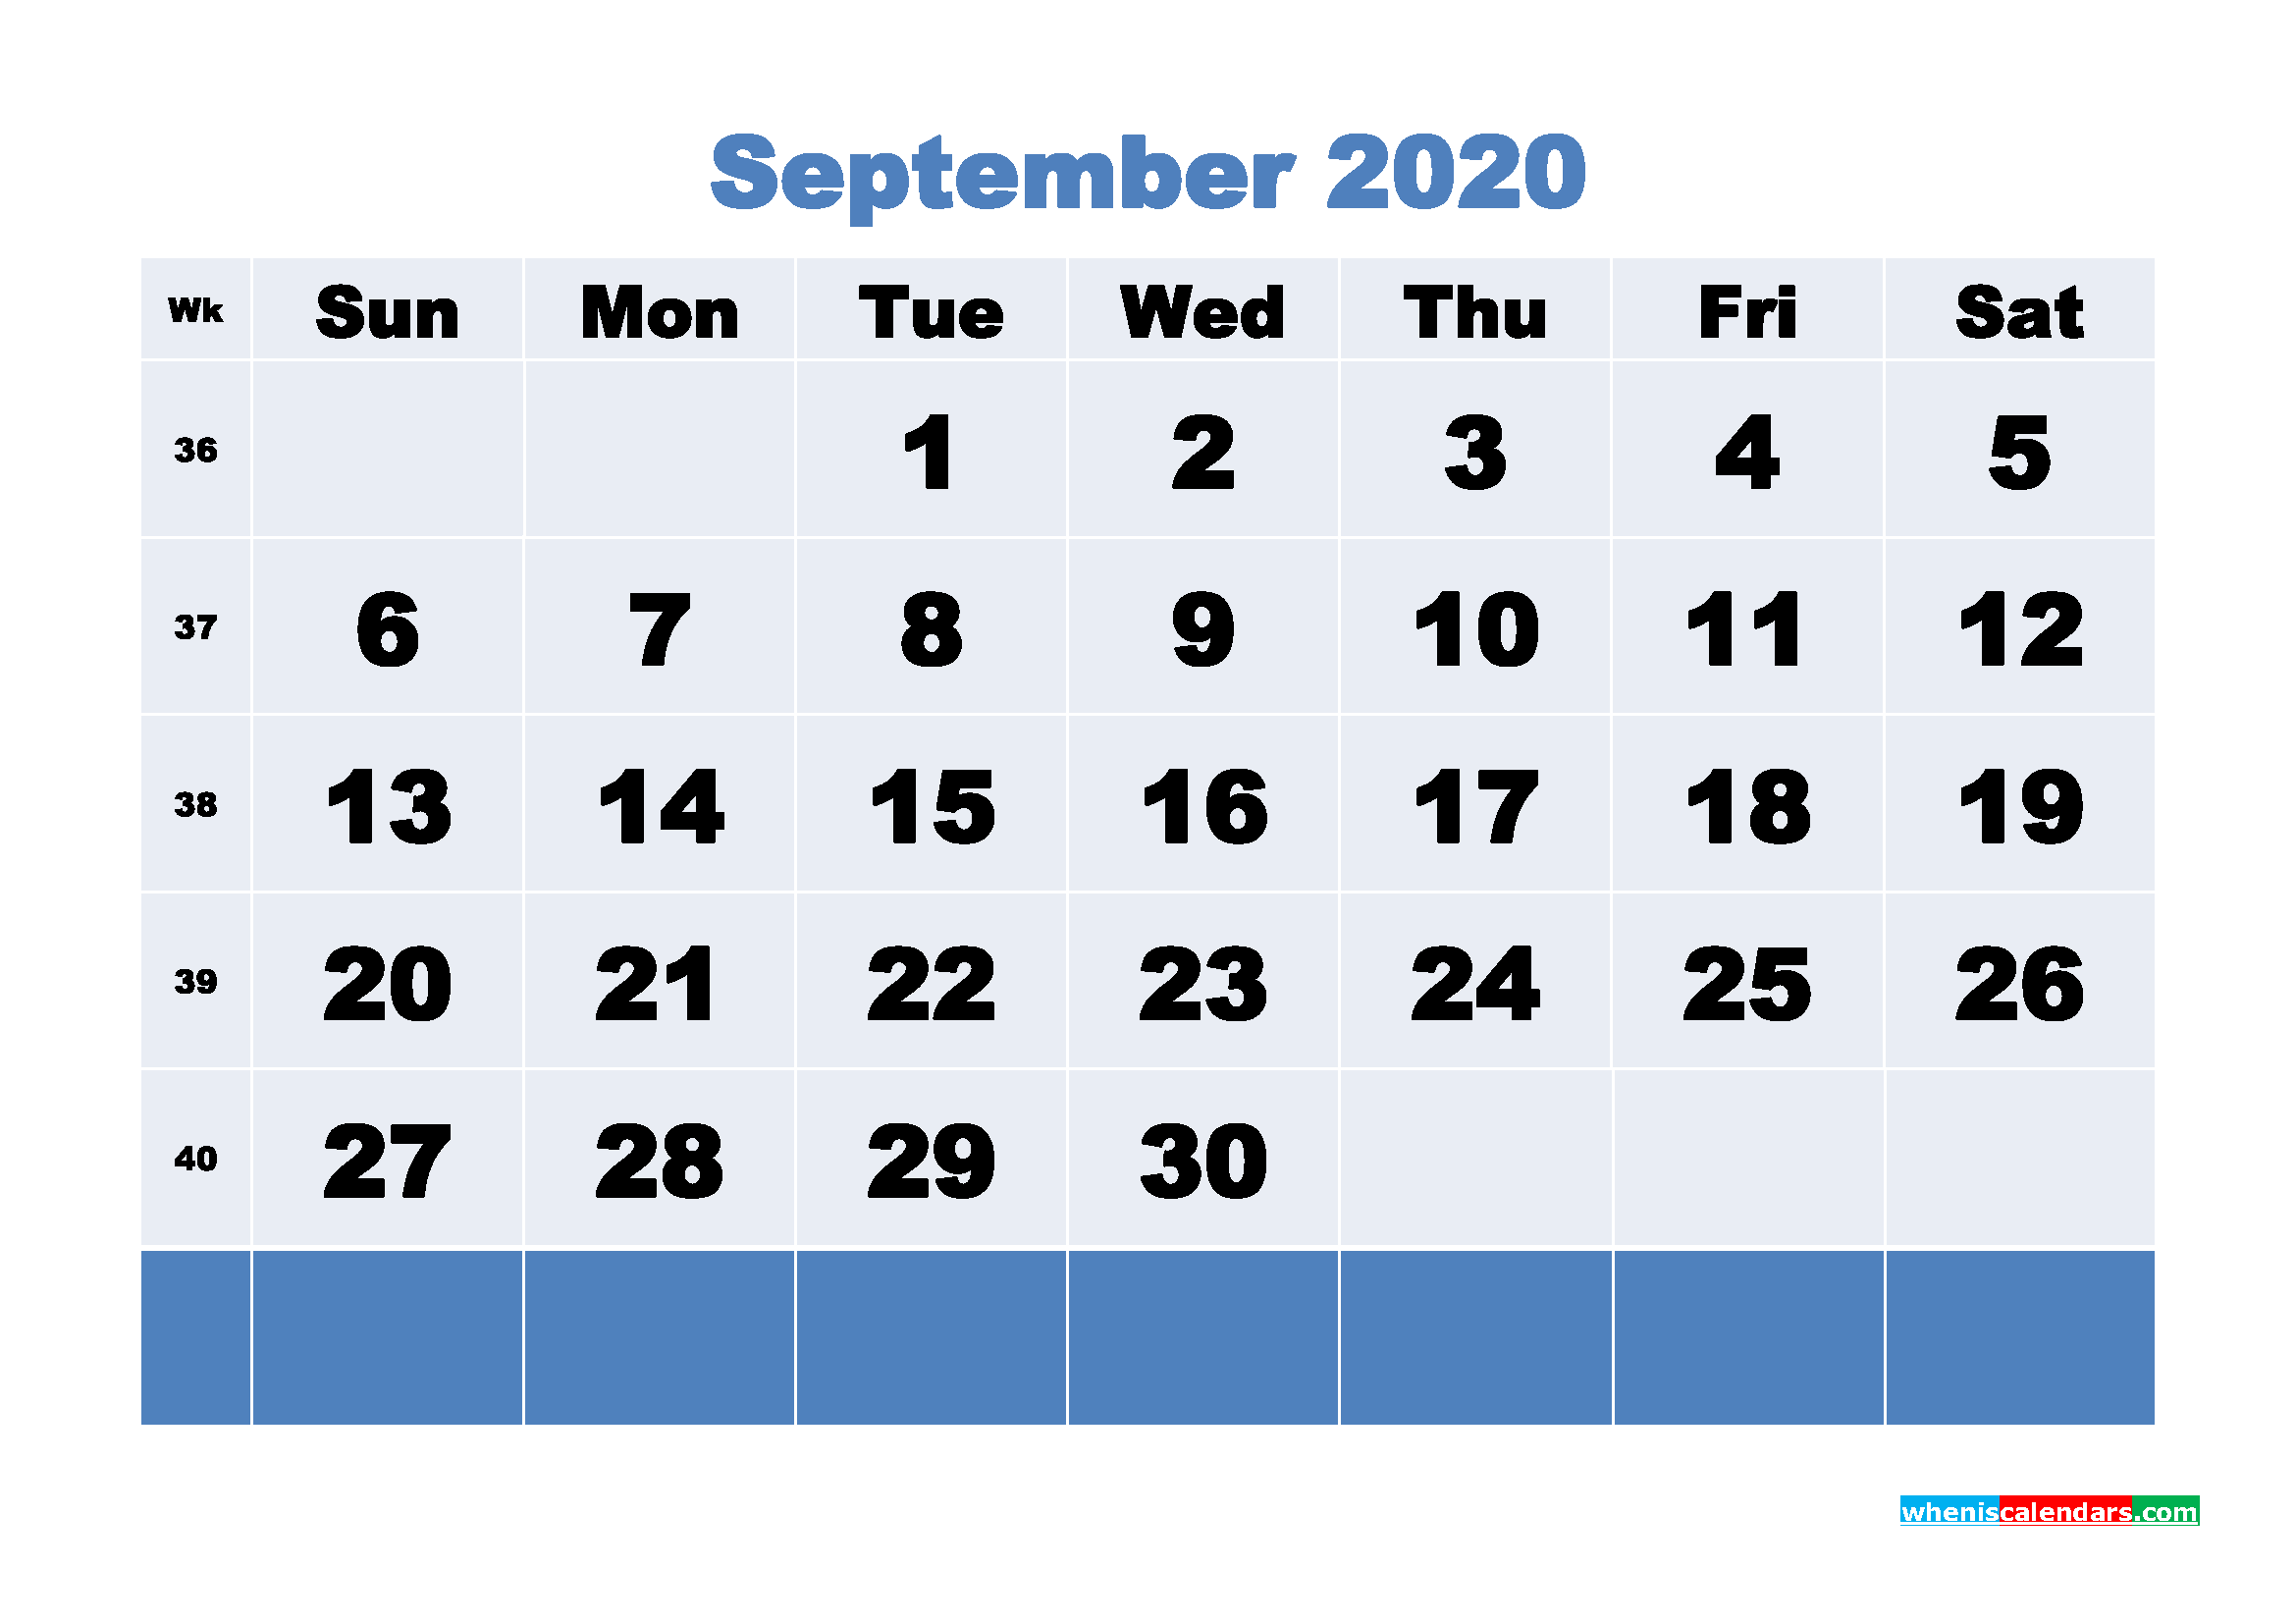 September Printable Calendar 2020 PDF, Word - No.m20b93